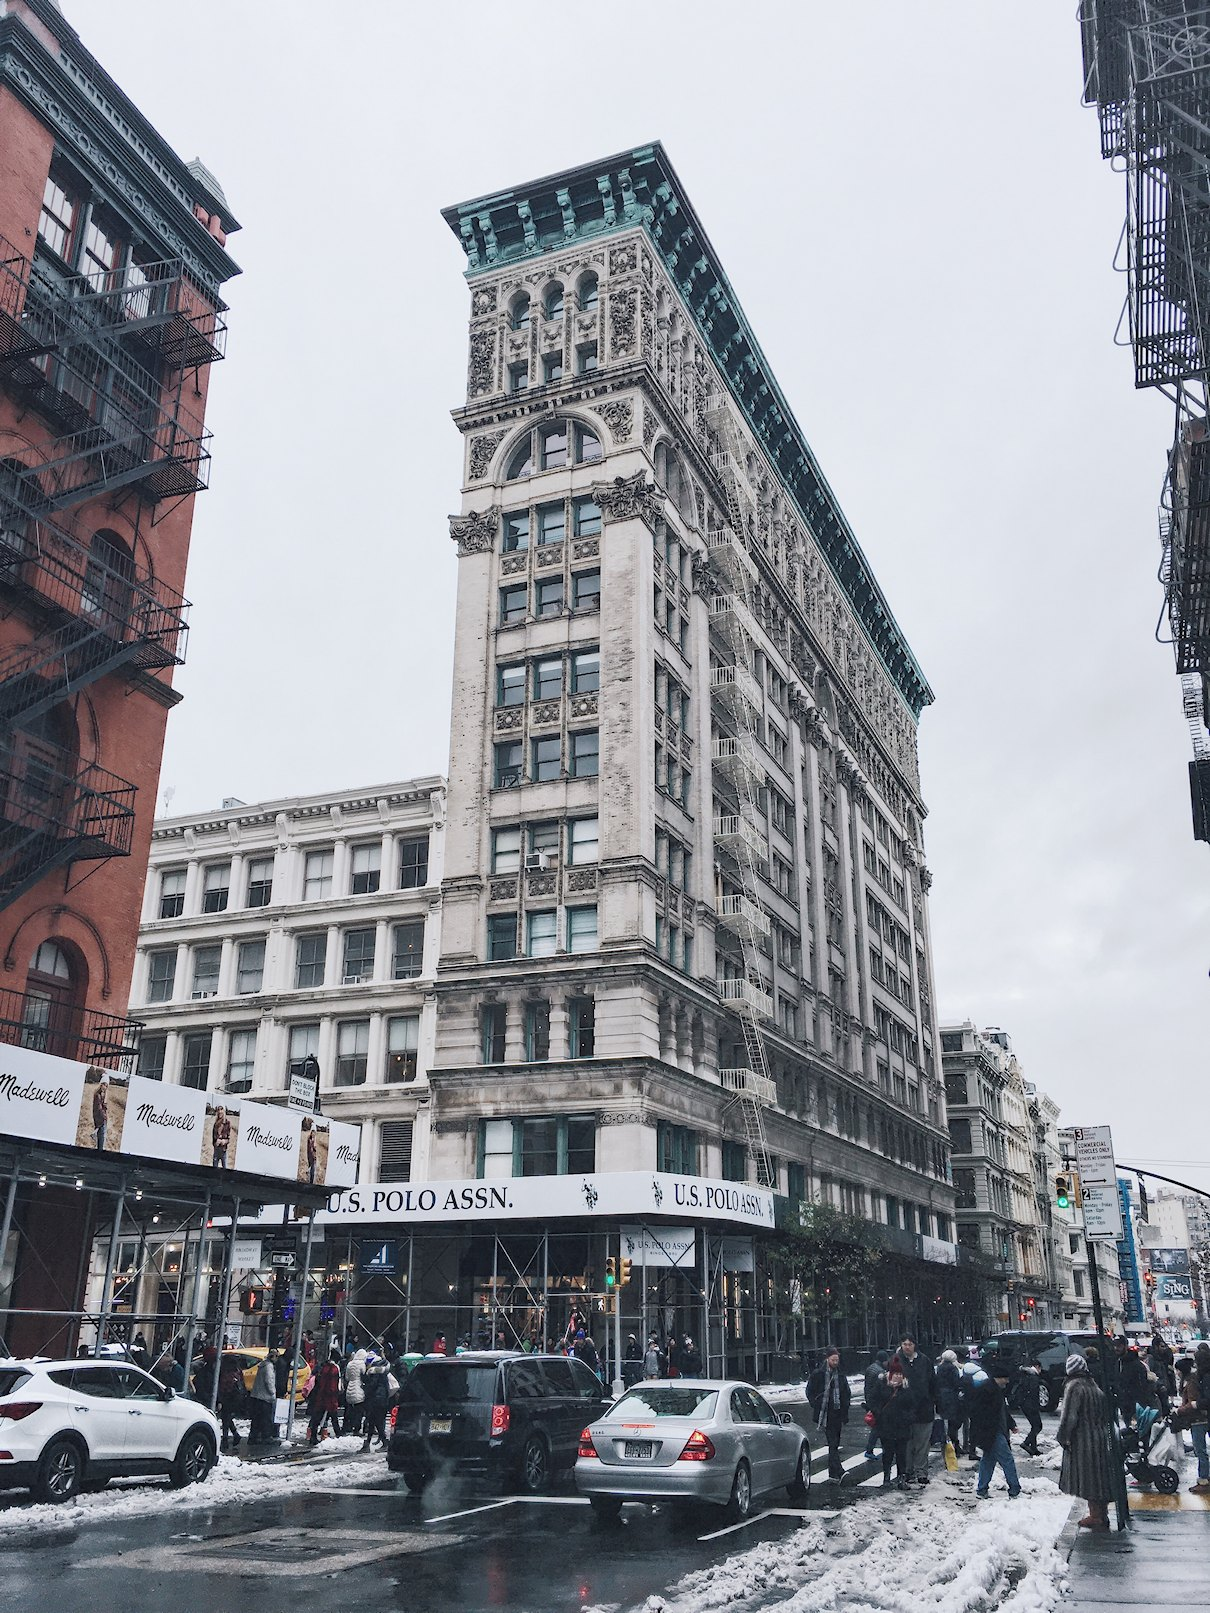 USA, Nowy Jork, SoHo